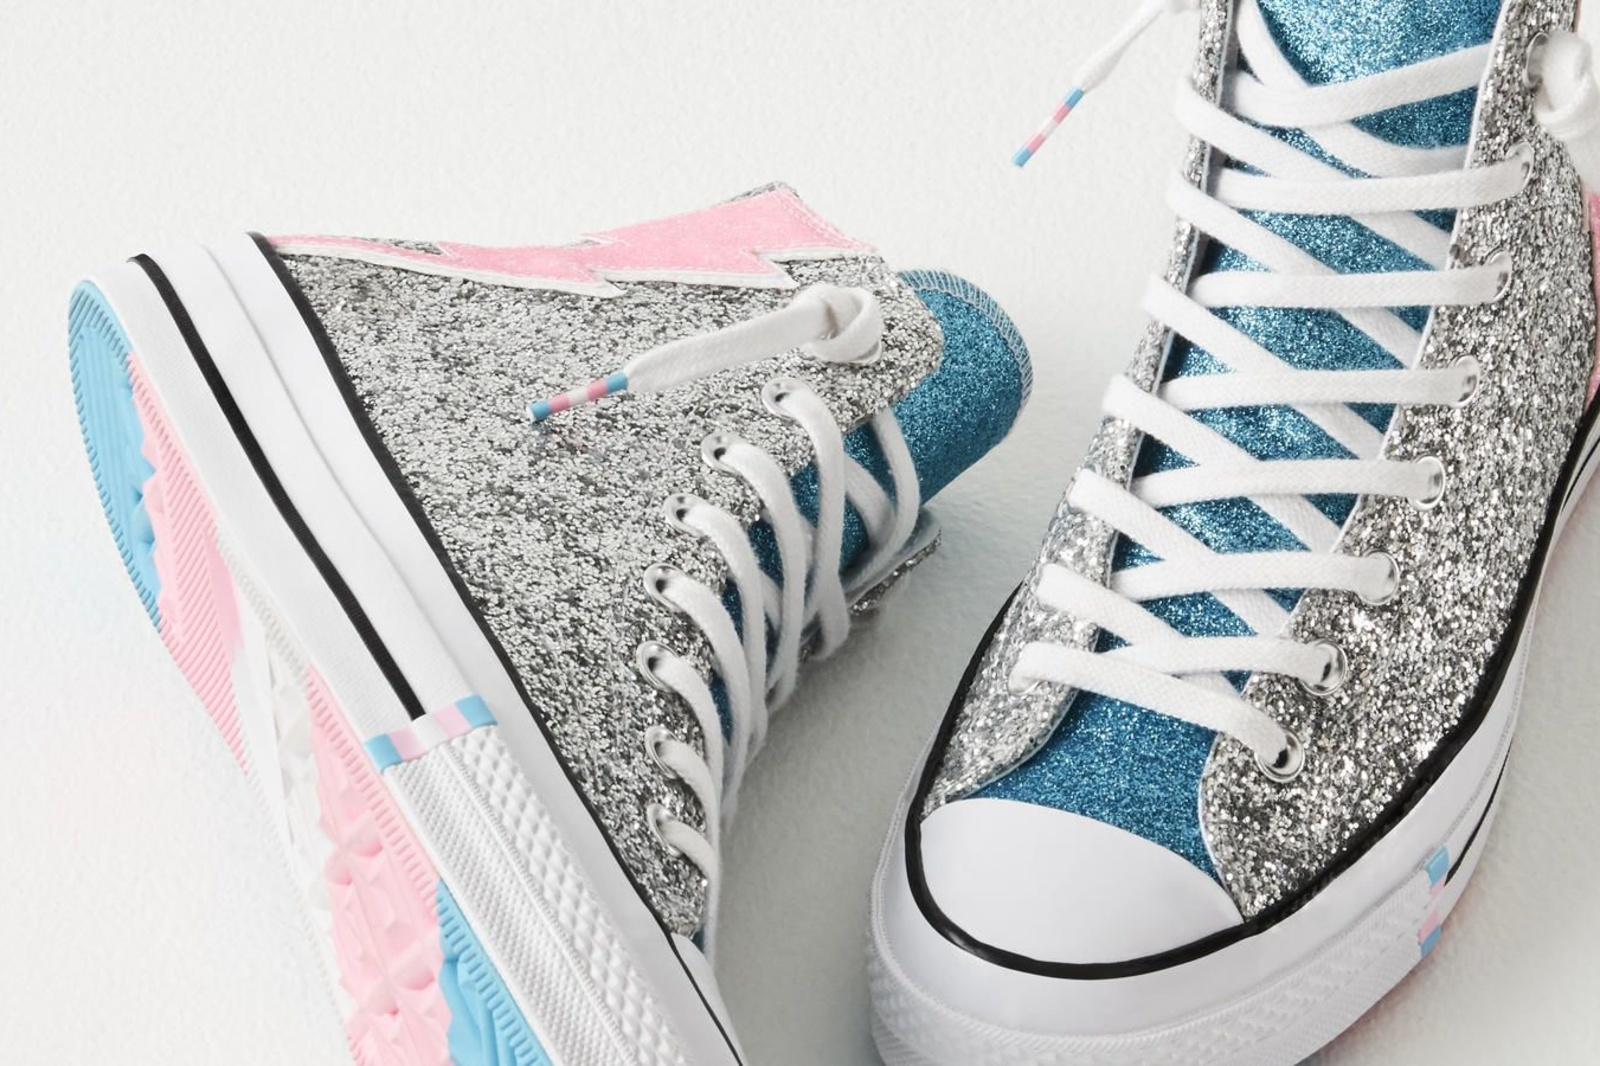 Nike brengt al sinds 2015 Pride-geïnspireerde Converse schoenen uit., Nike